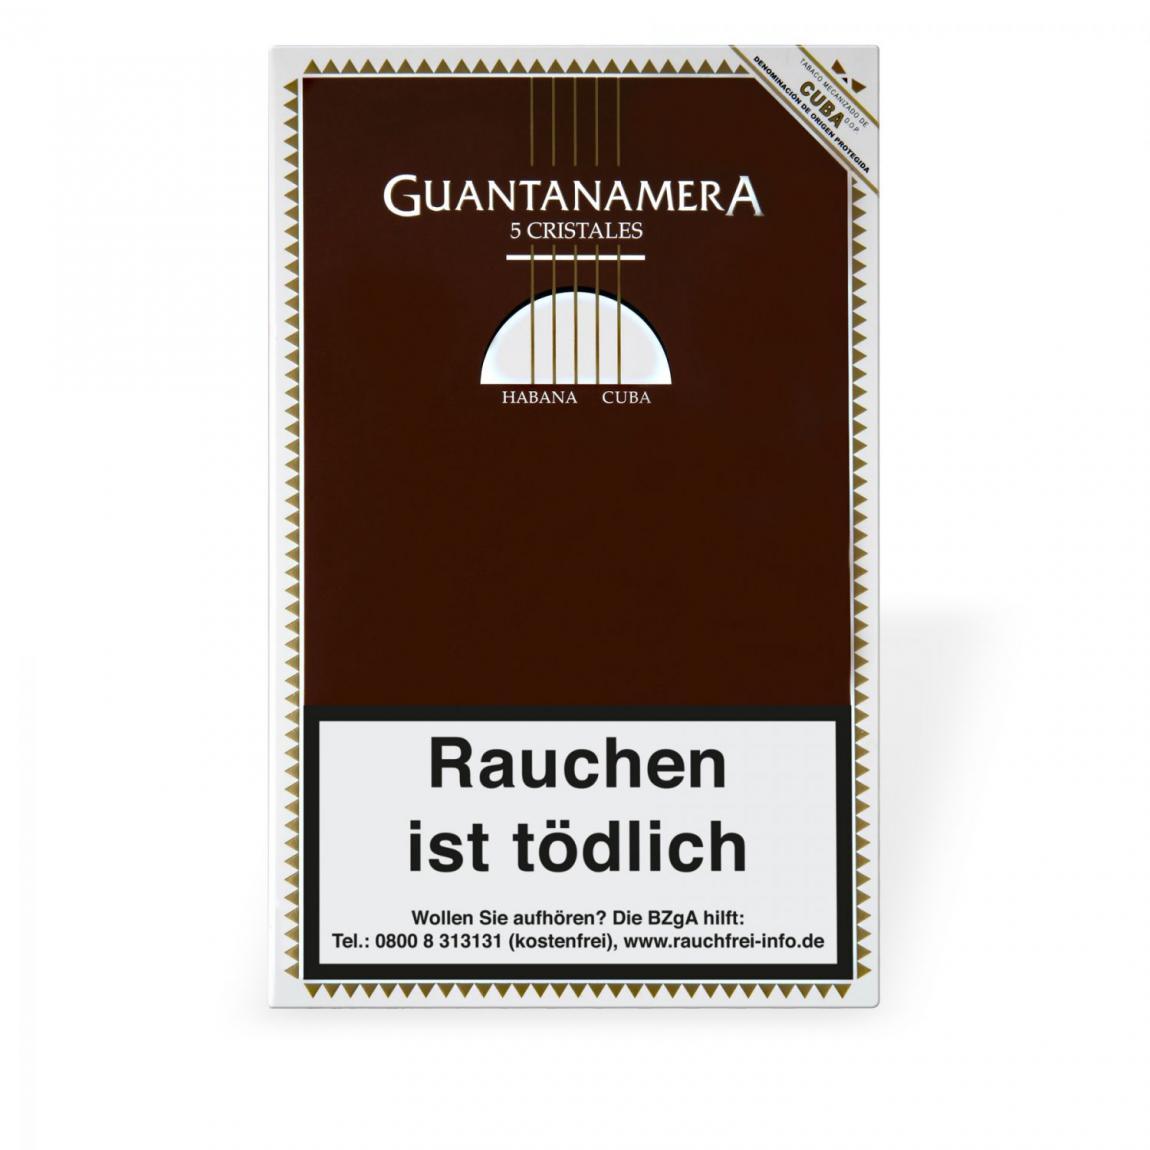 Guantanamera Cristales Tubos 5er Schachtel